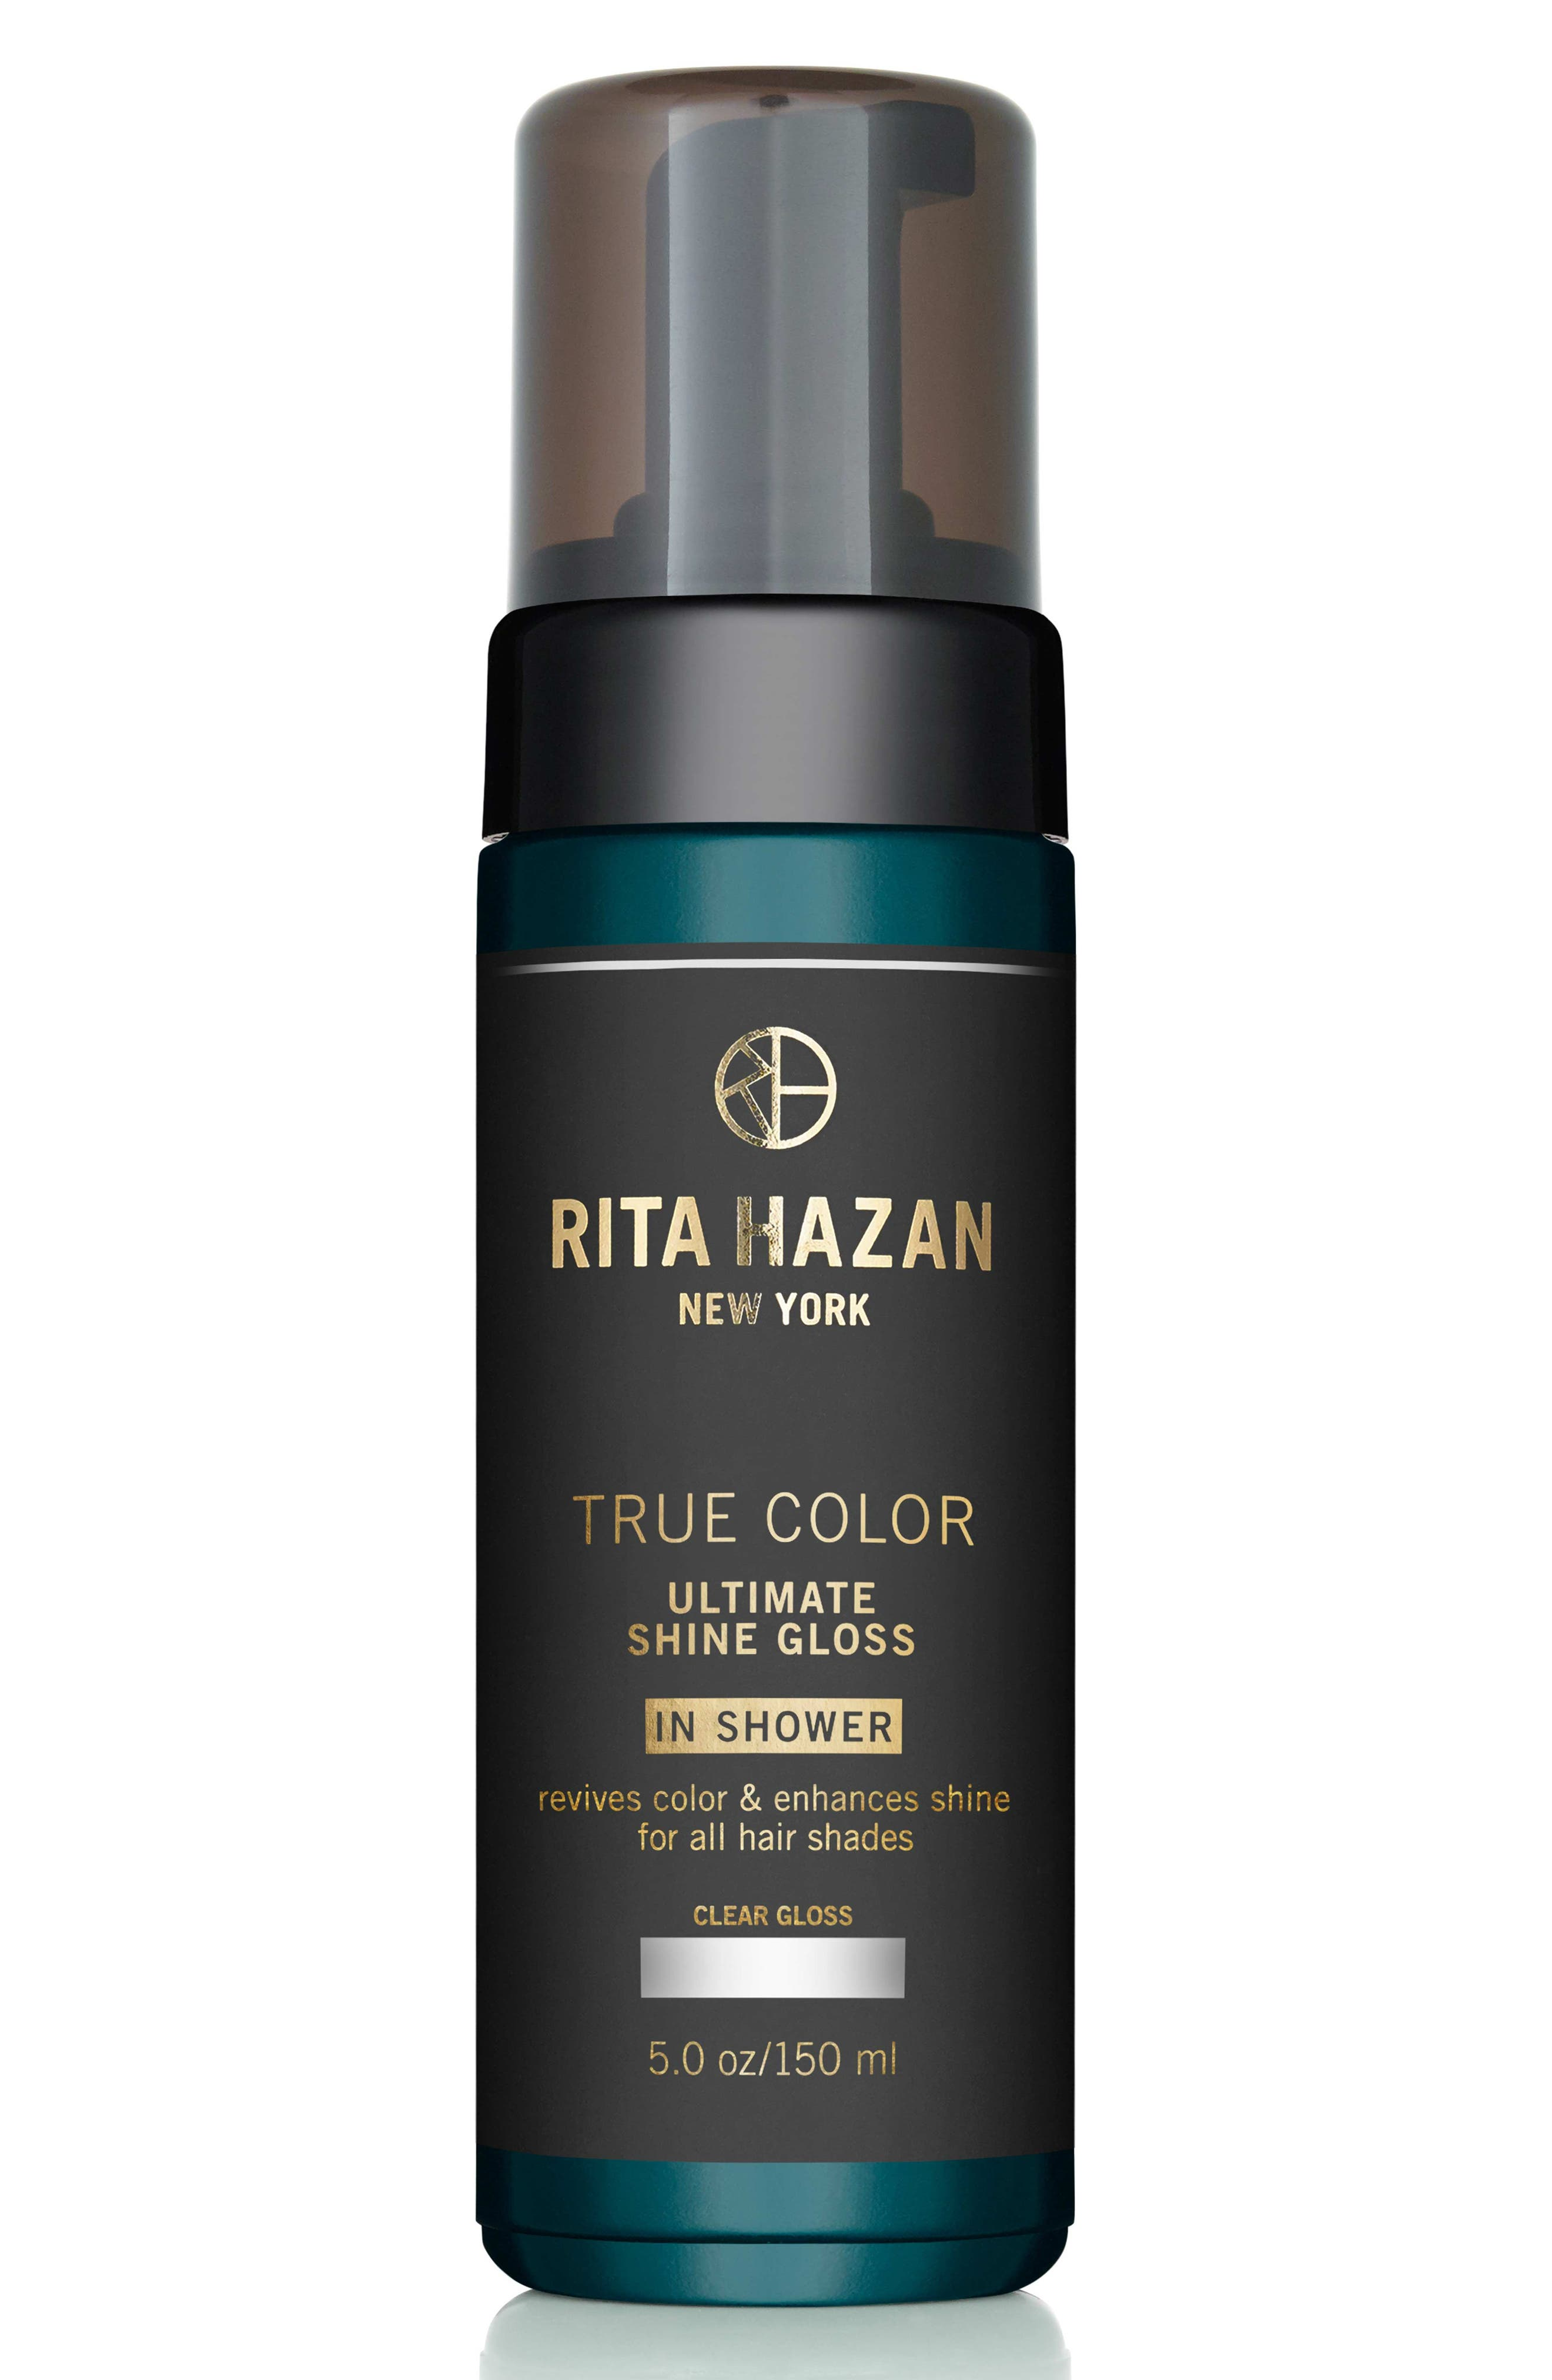 RITA HAZAN NEW YORK 'True Color' Ultimate Shine Gloss, Main, color, CLEAR